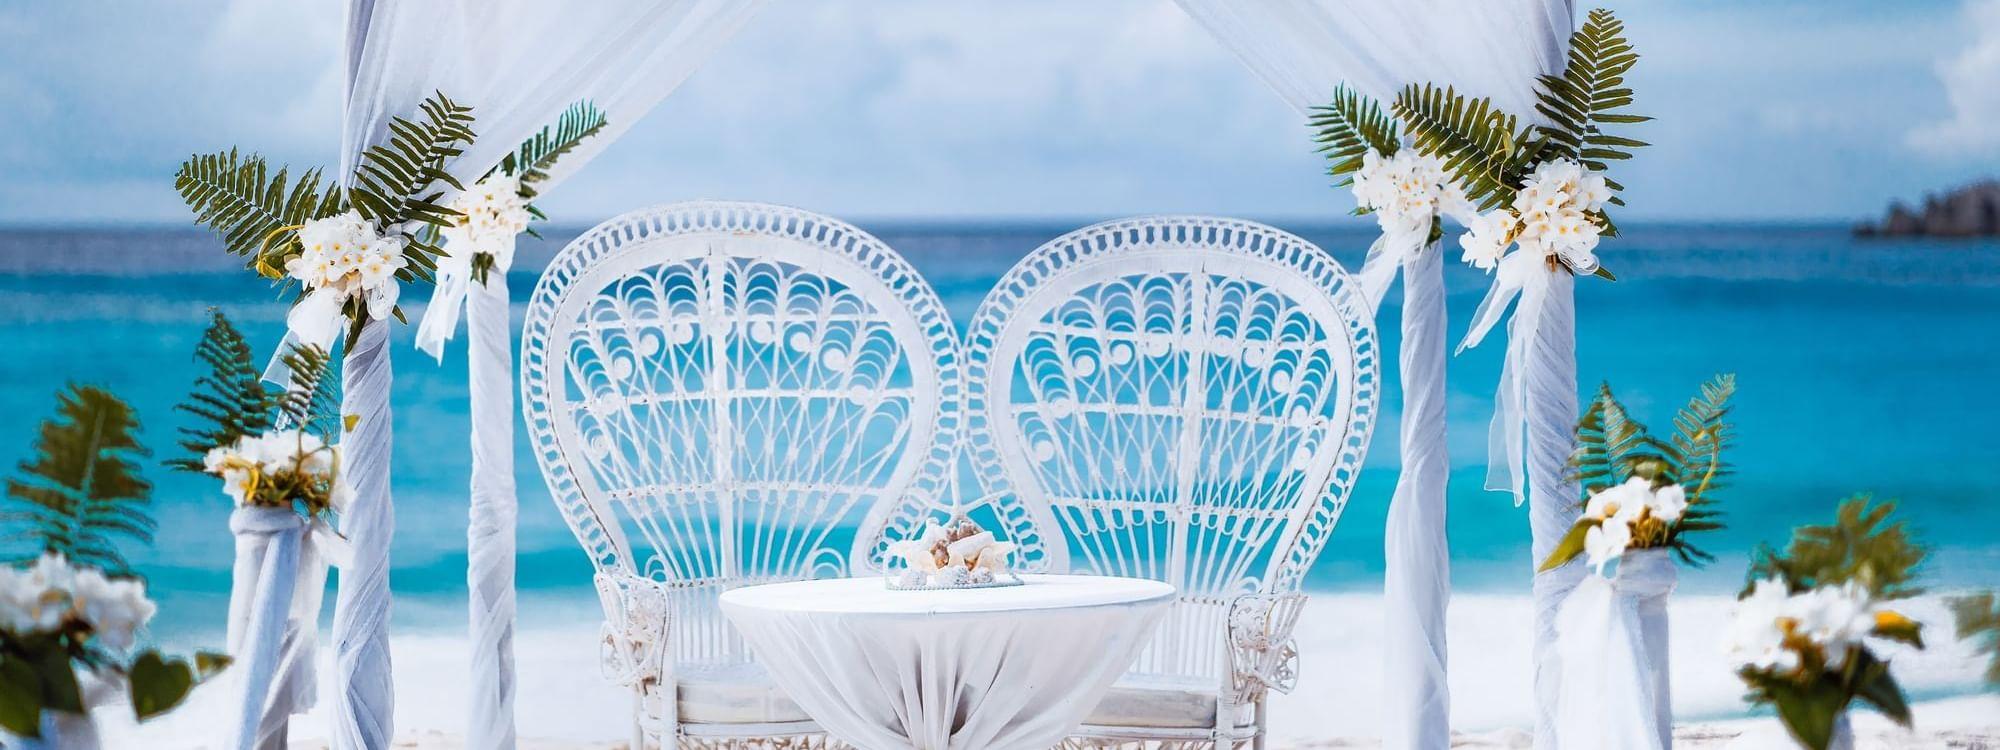 Wedding couch decorations on beach at Daydream Island Resort